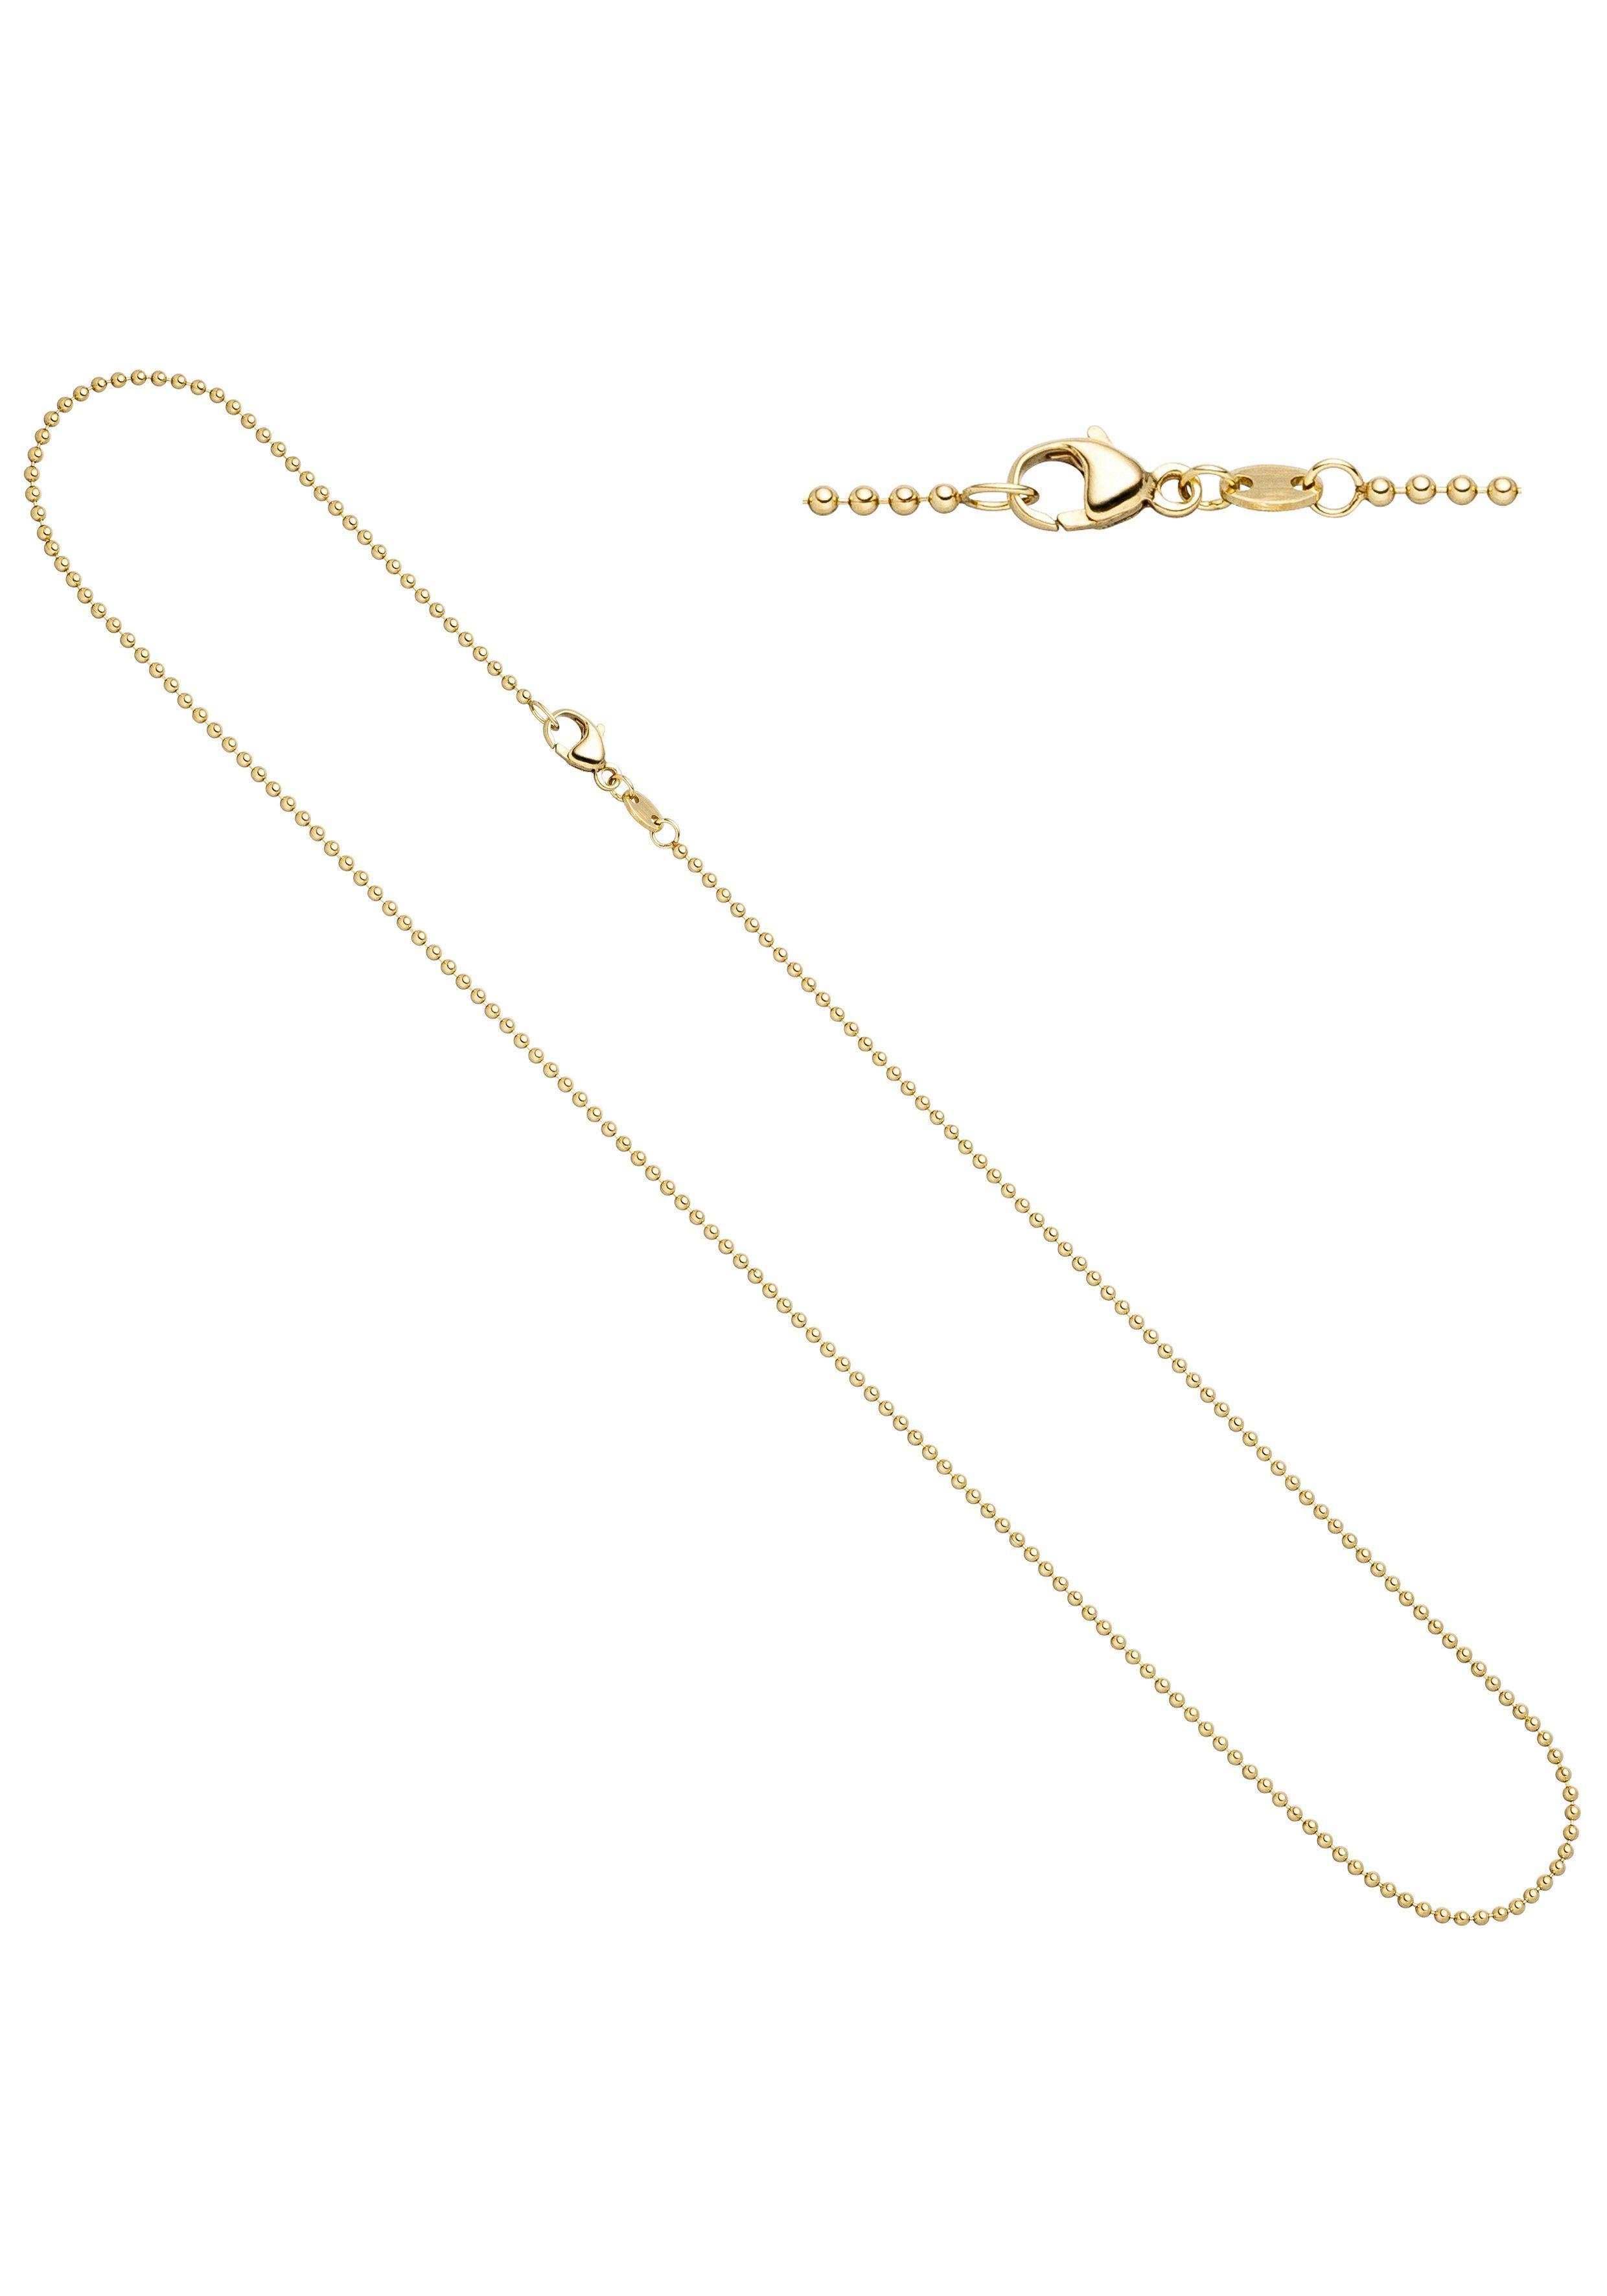 JOBO Goldkette Kugelkette 585 Gold 42 cm 1,5 mm